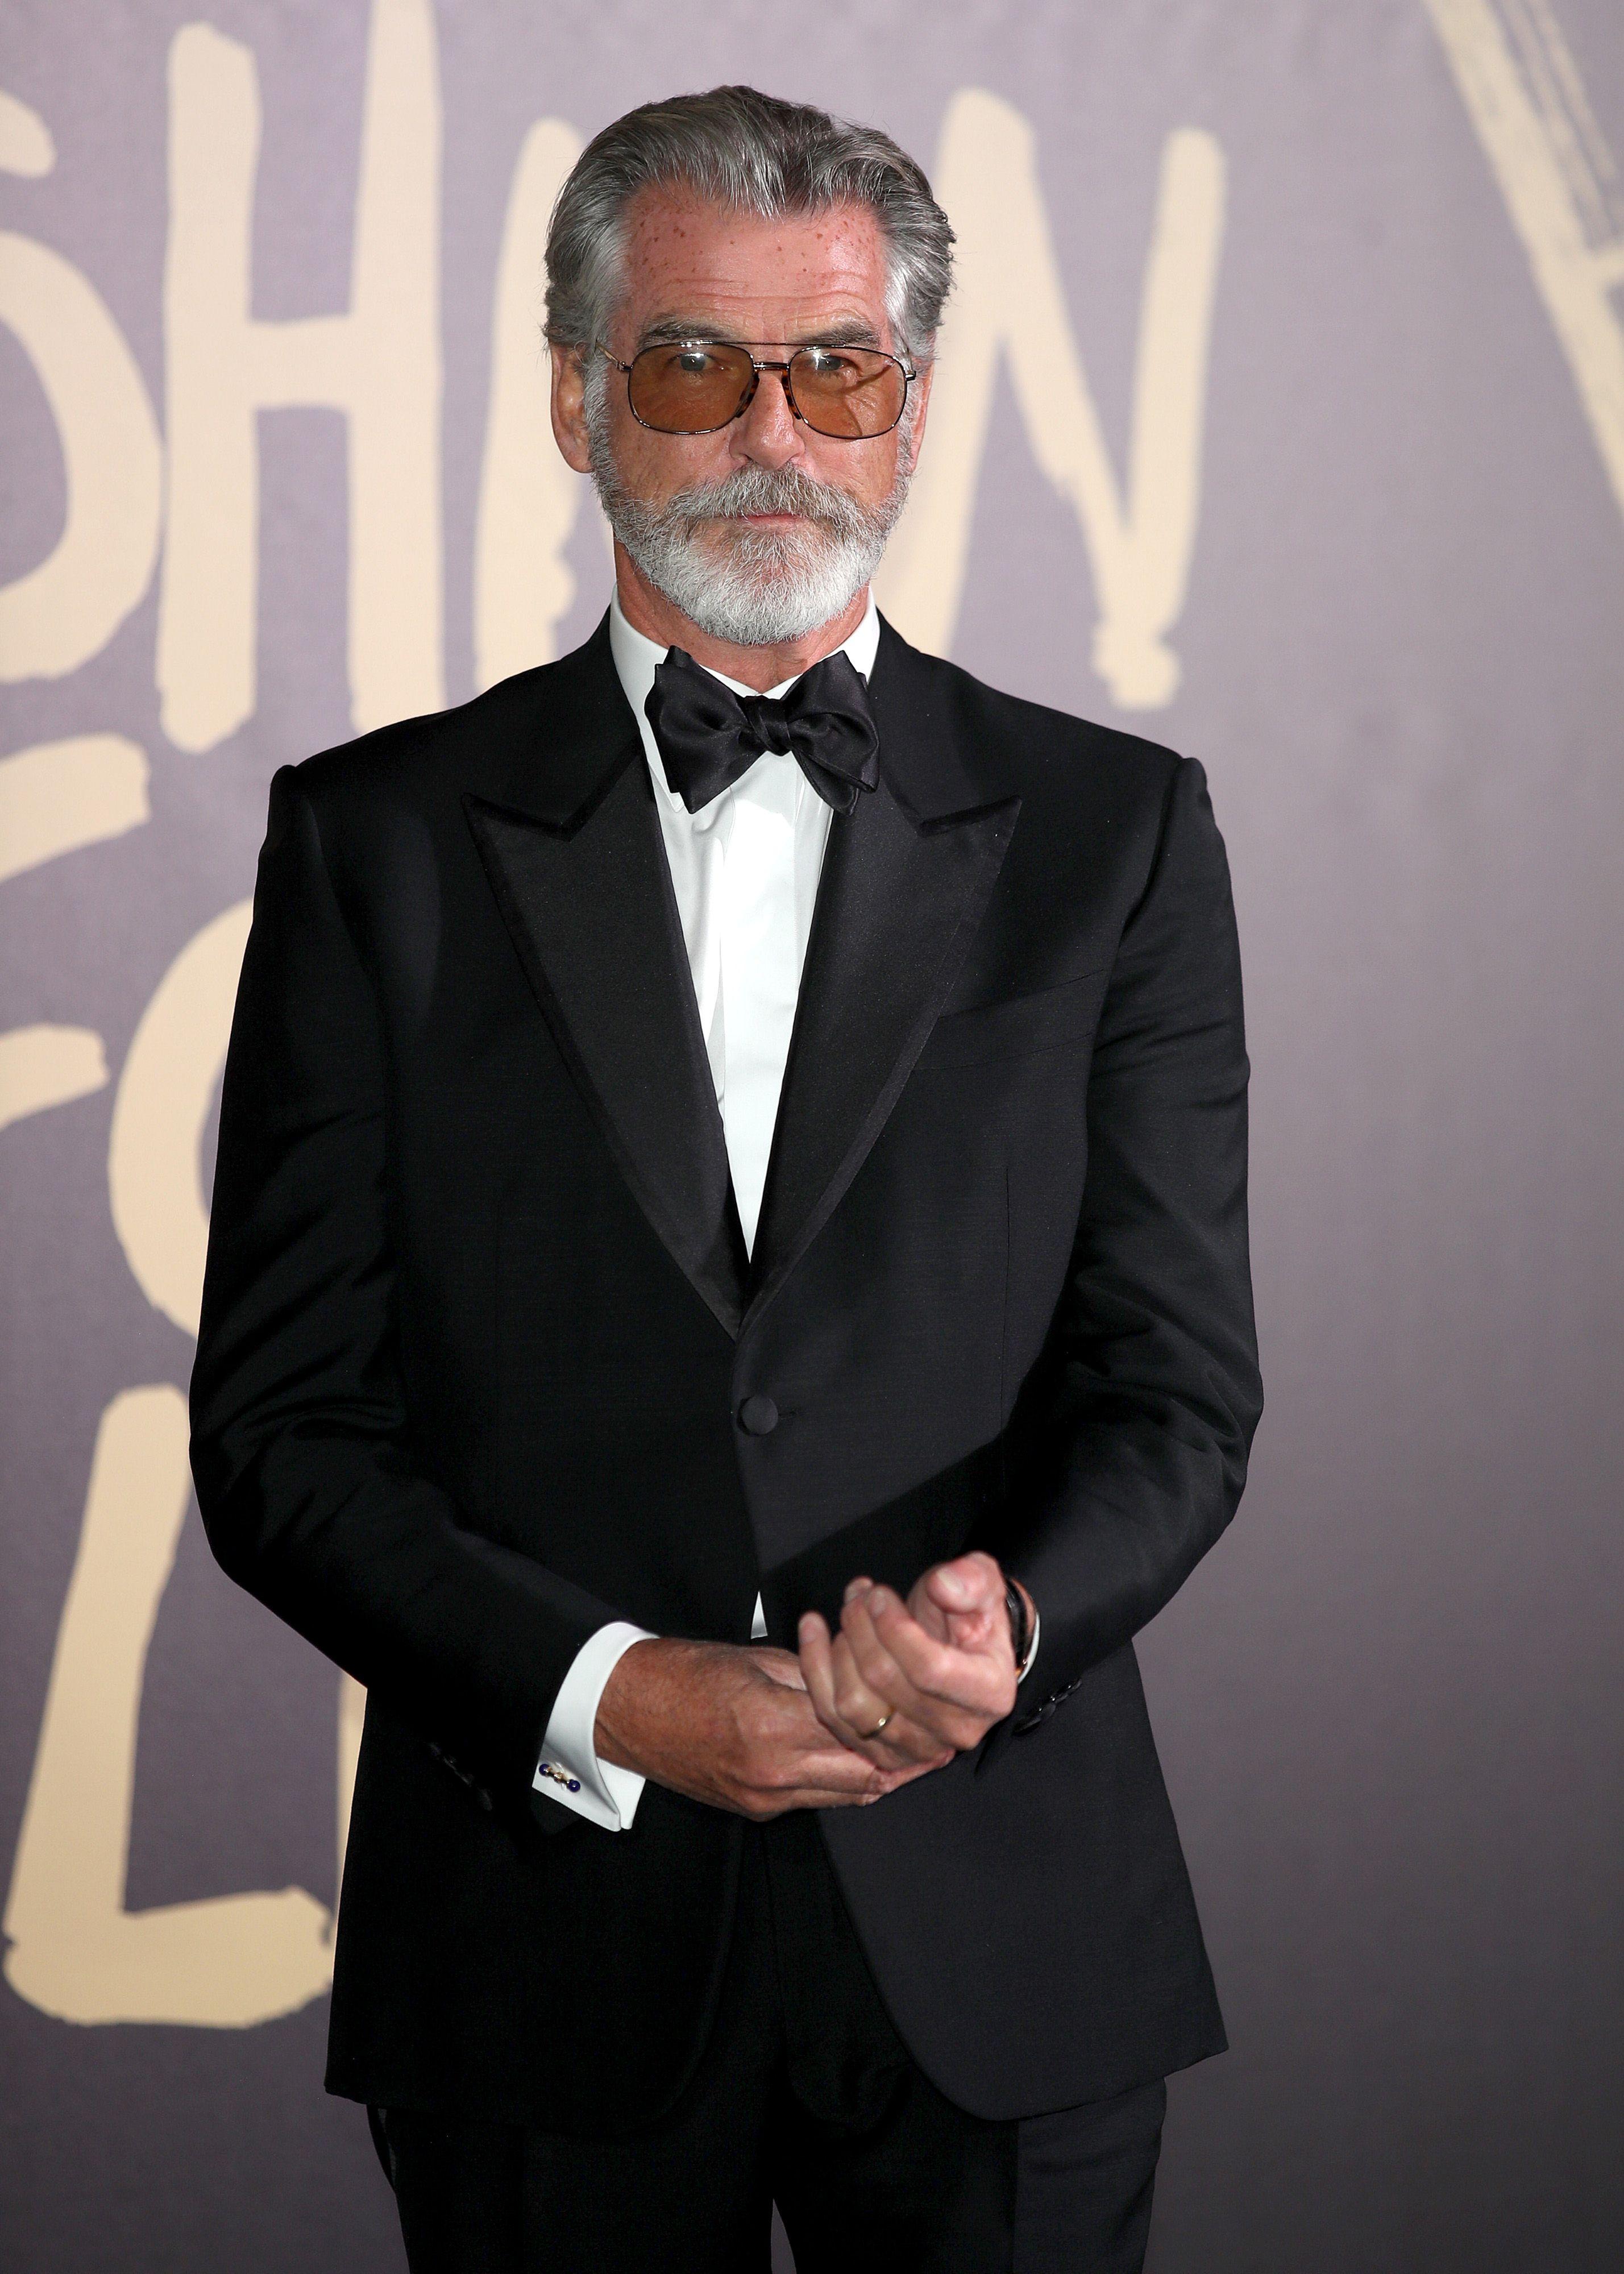 At 66, Pierce Brosnan Is Cooler Than James Bond Himself